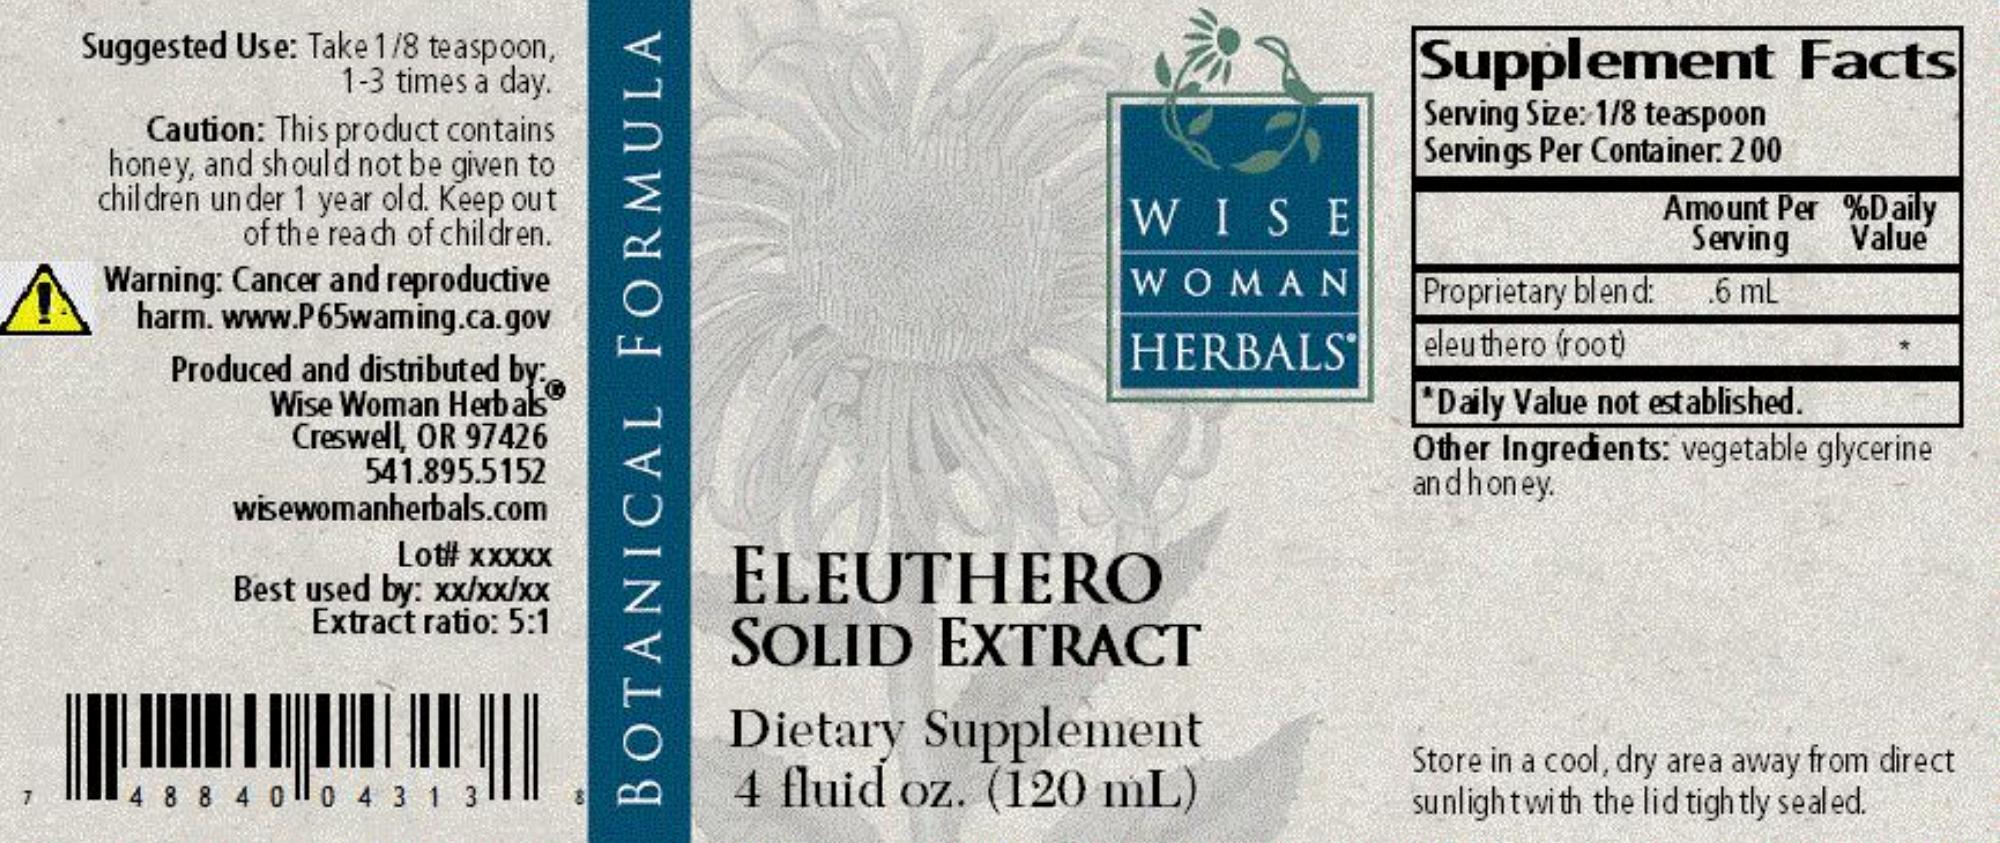 Eleuthero Solid Extract